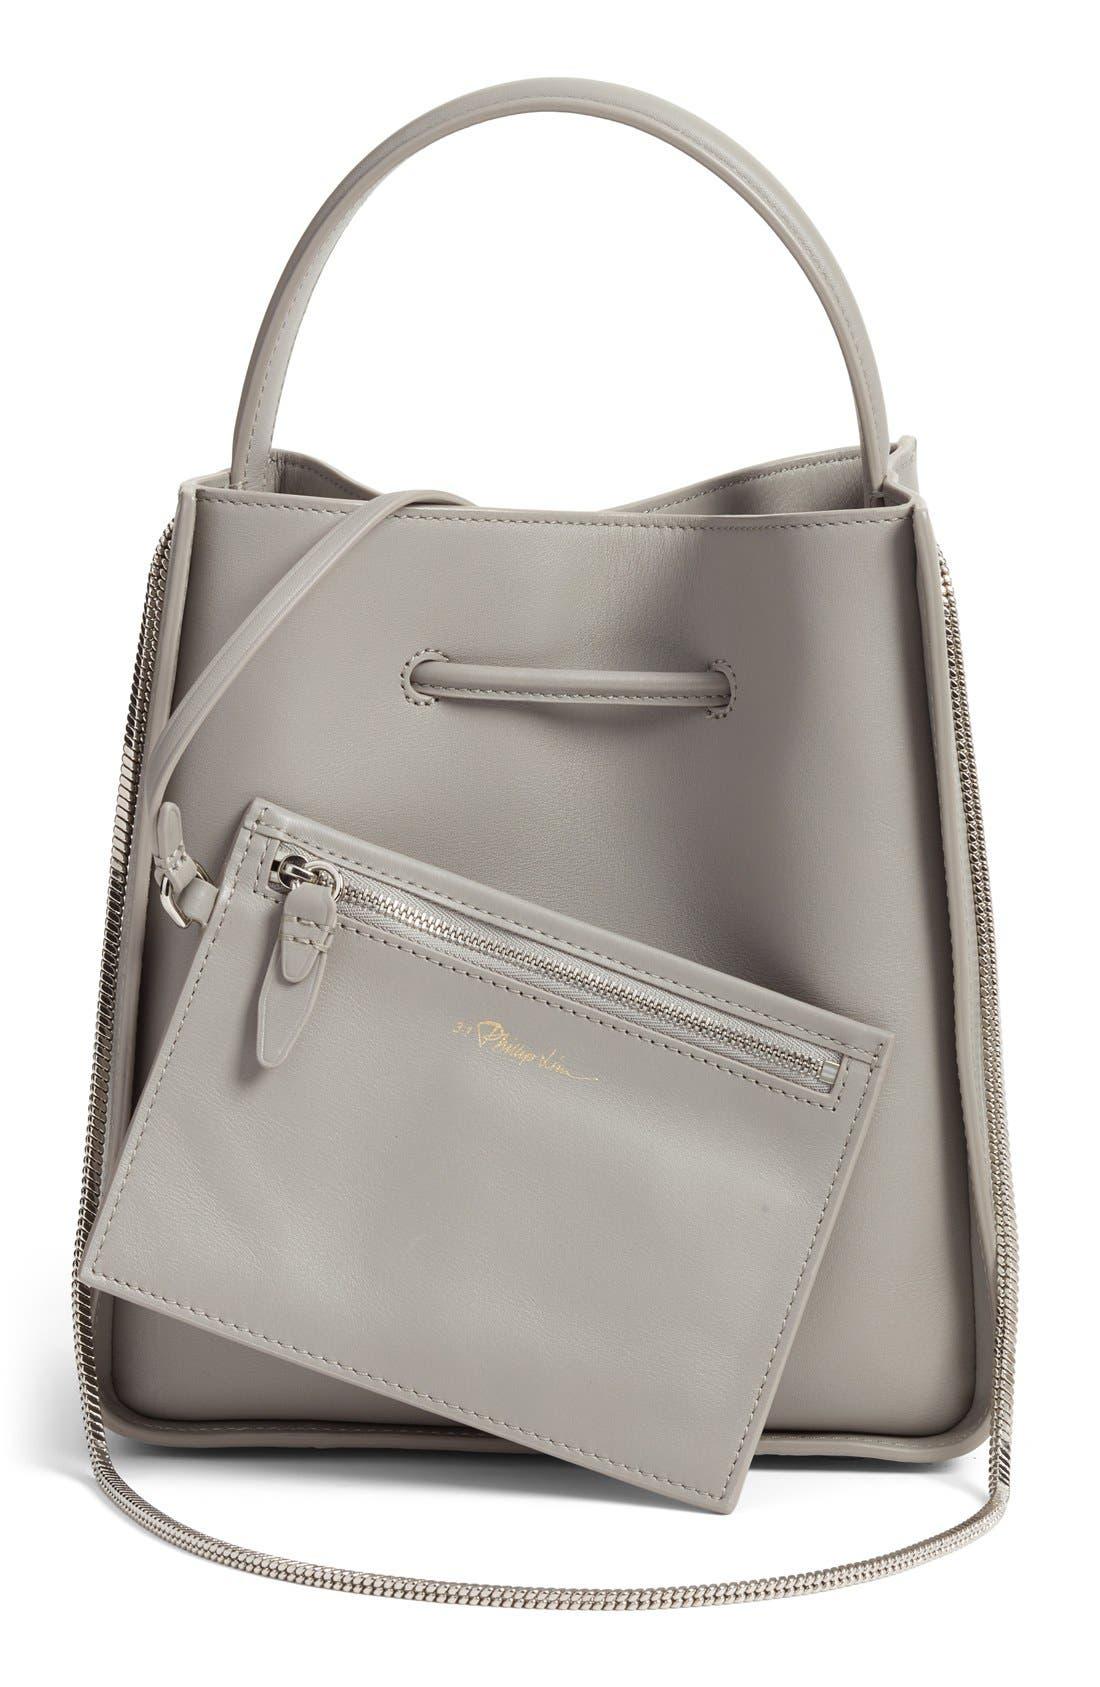 Alternate Image 2  - 3.1 Phillip Lim Small Soleil Leather Bucket Bag